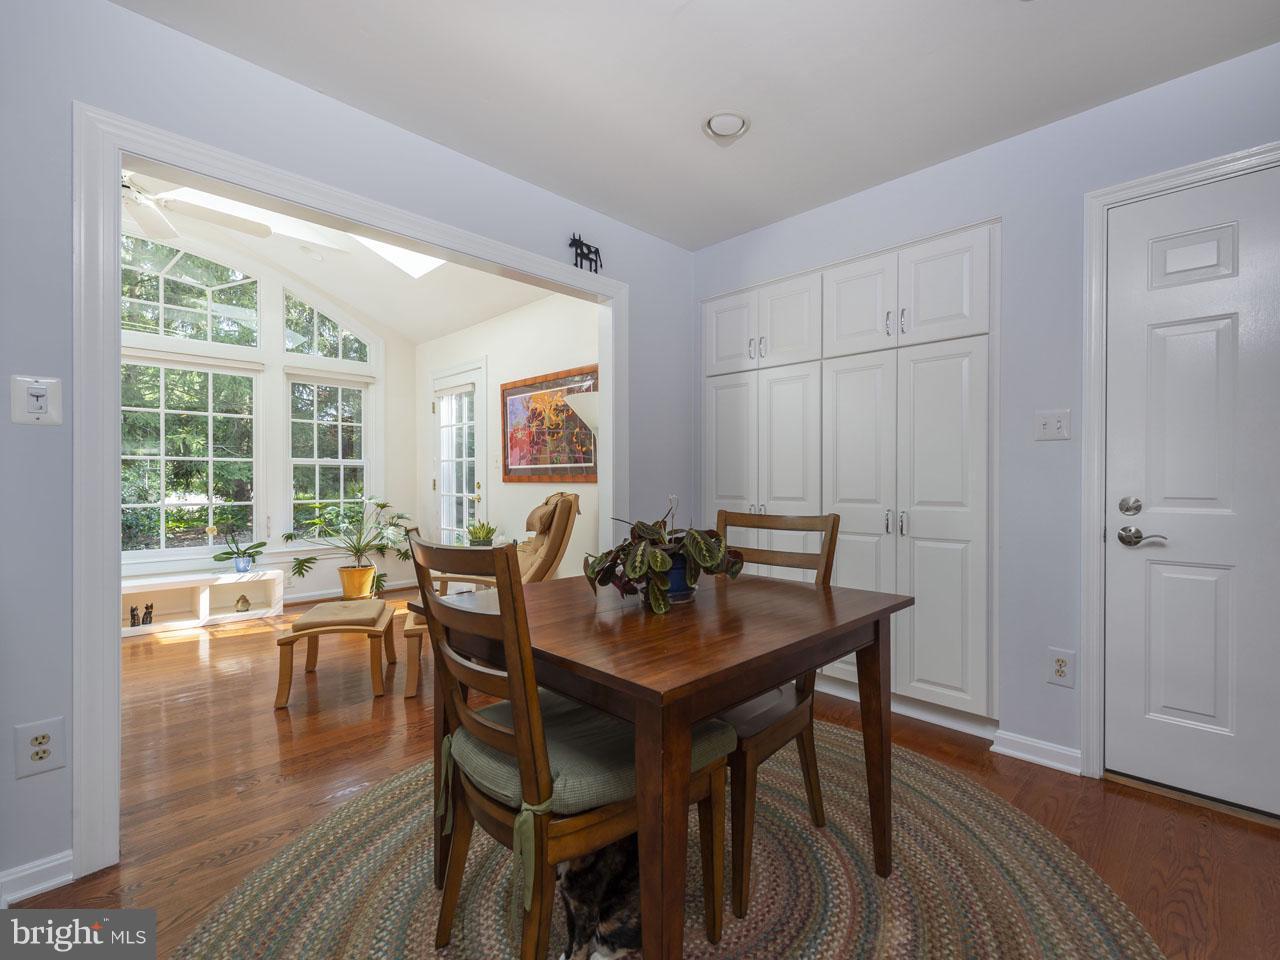 1006211278-300688039594-2021-07-22-07-39-38        Burke Delaware Real Estate For Sale   MLS# 1006211278  - Best of Northern Virginia